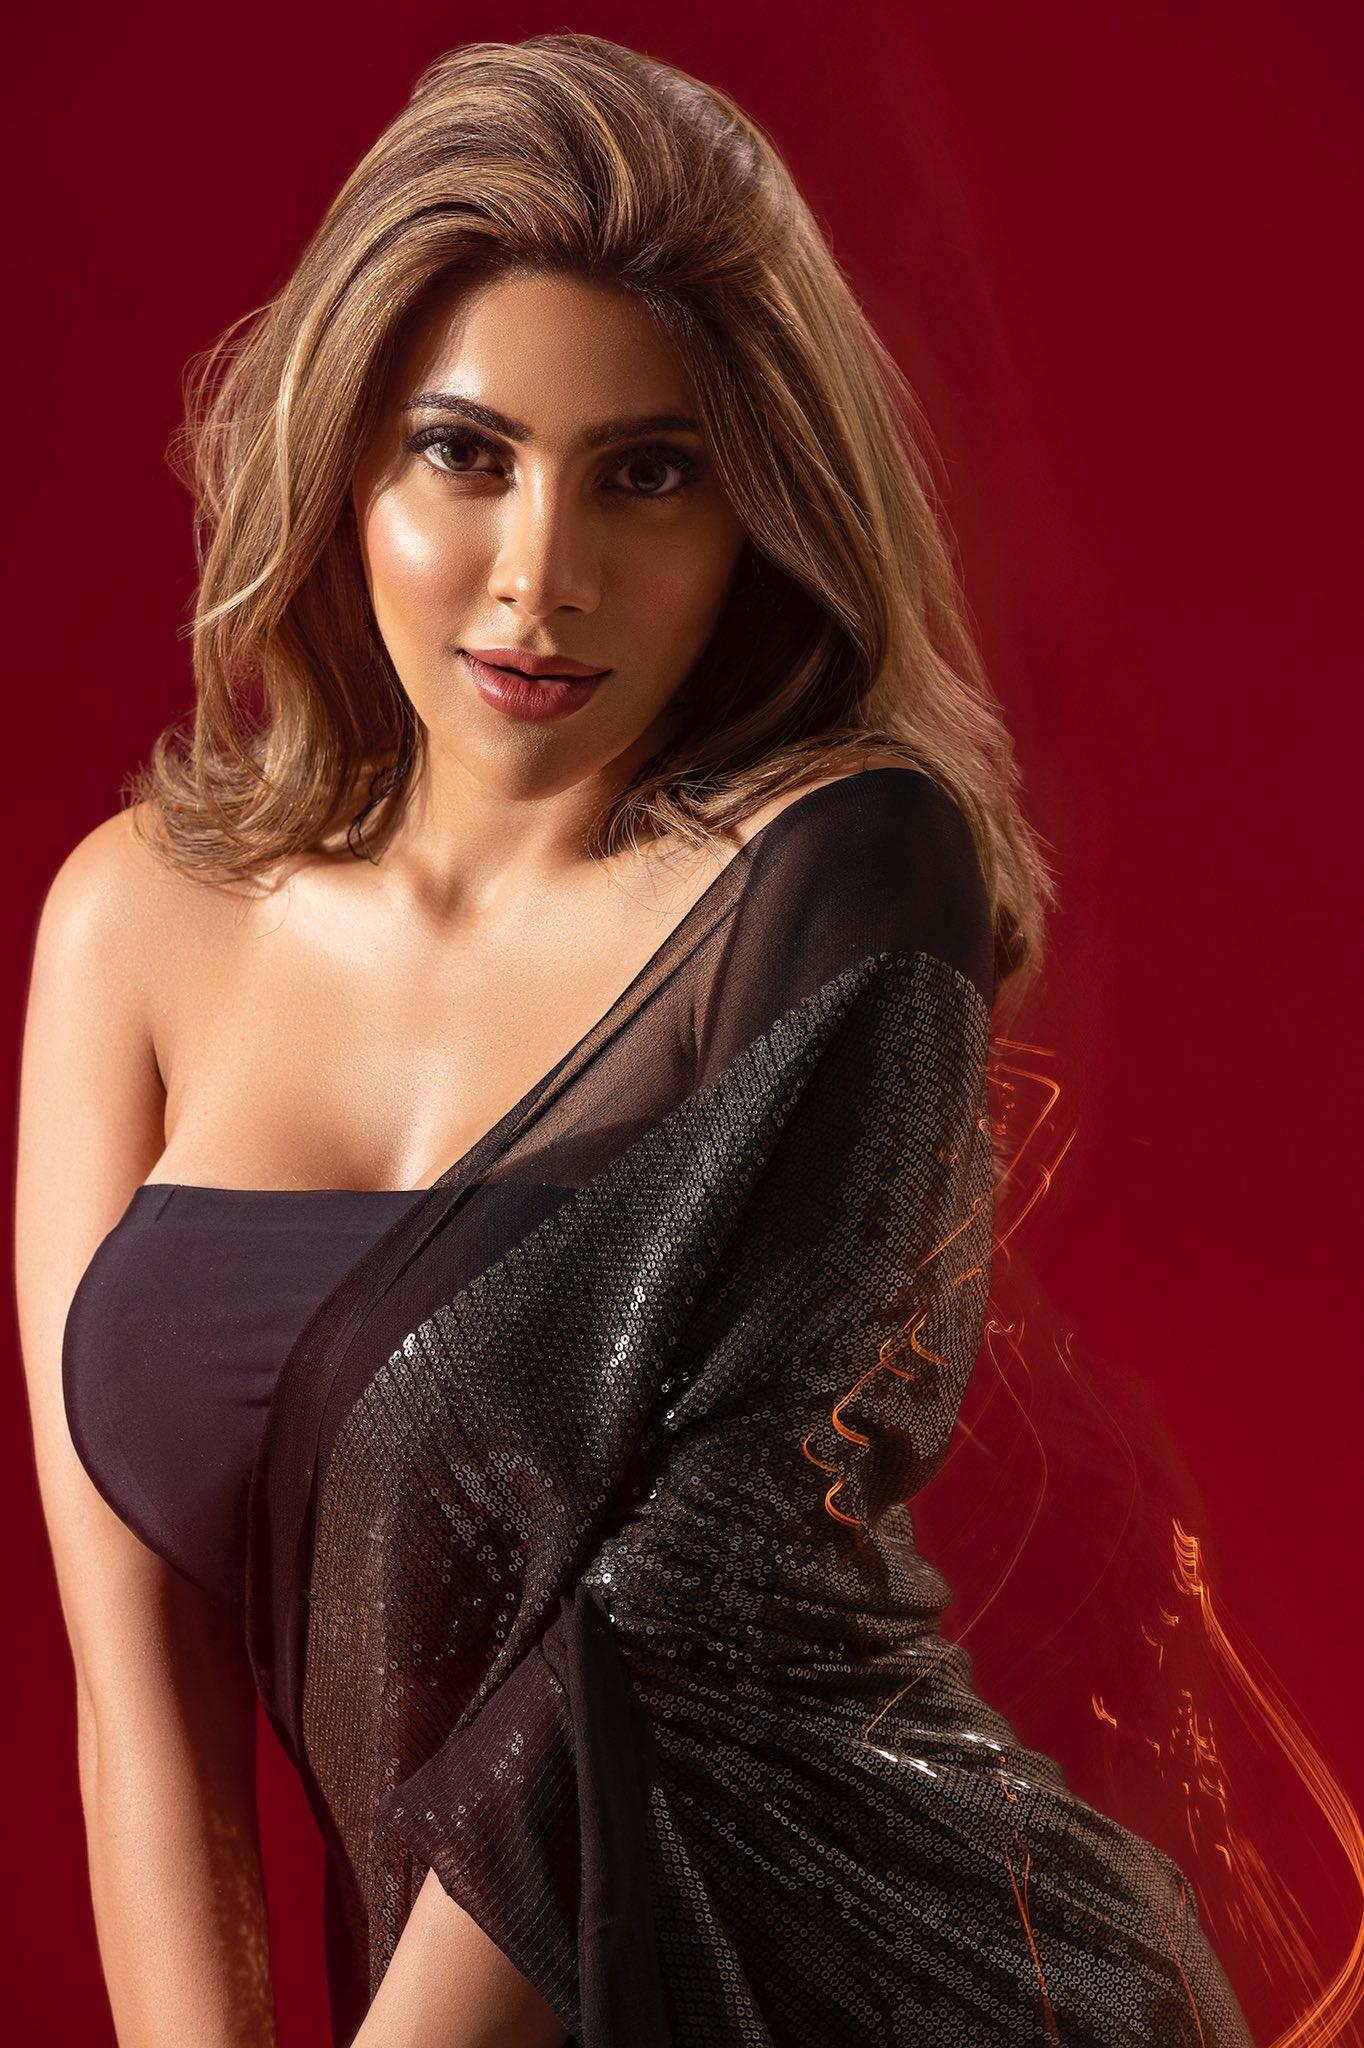 Nikki Tamboli Hot Photos Stills From Fablook Magazine